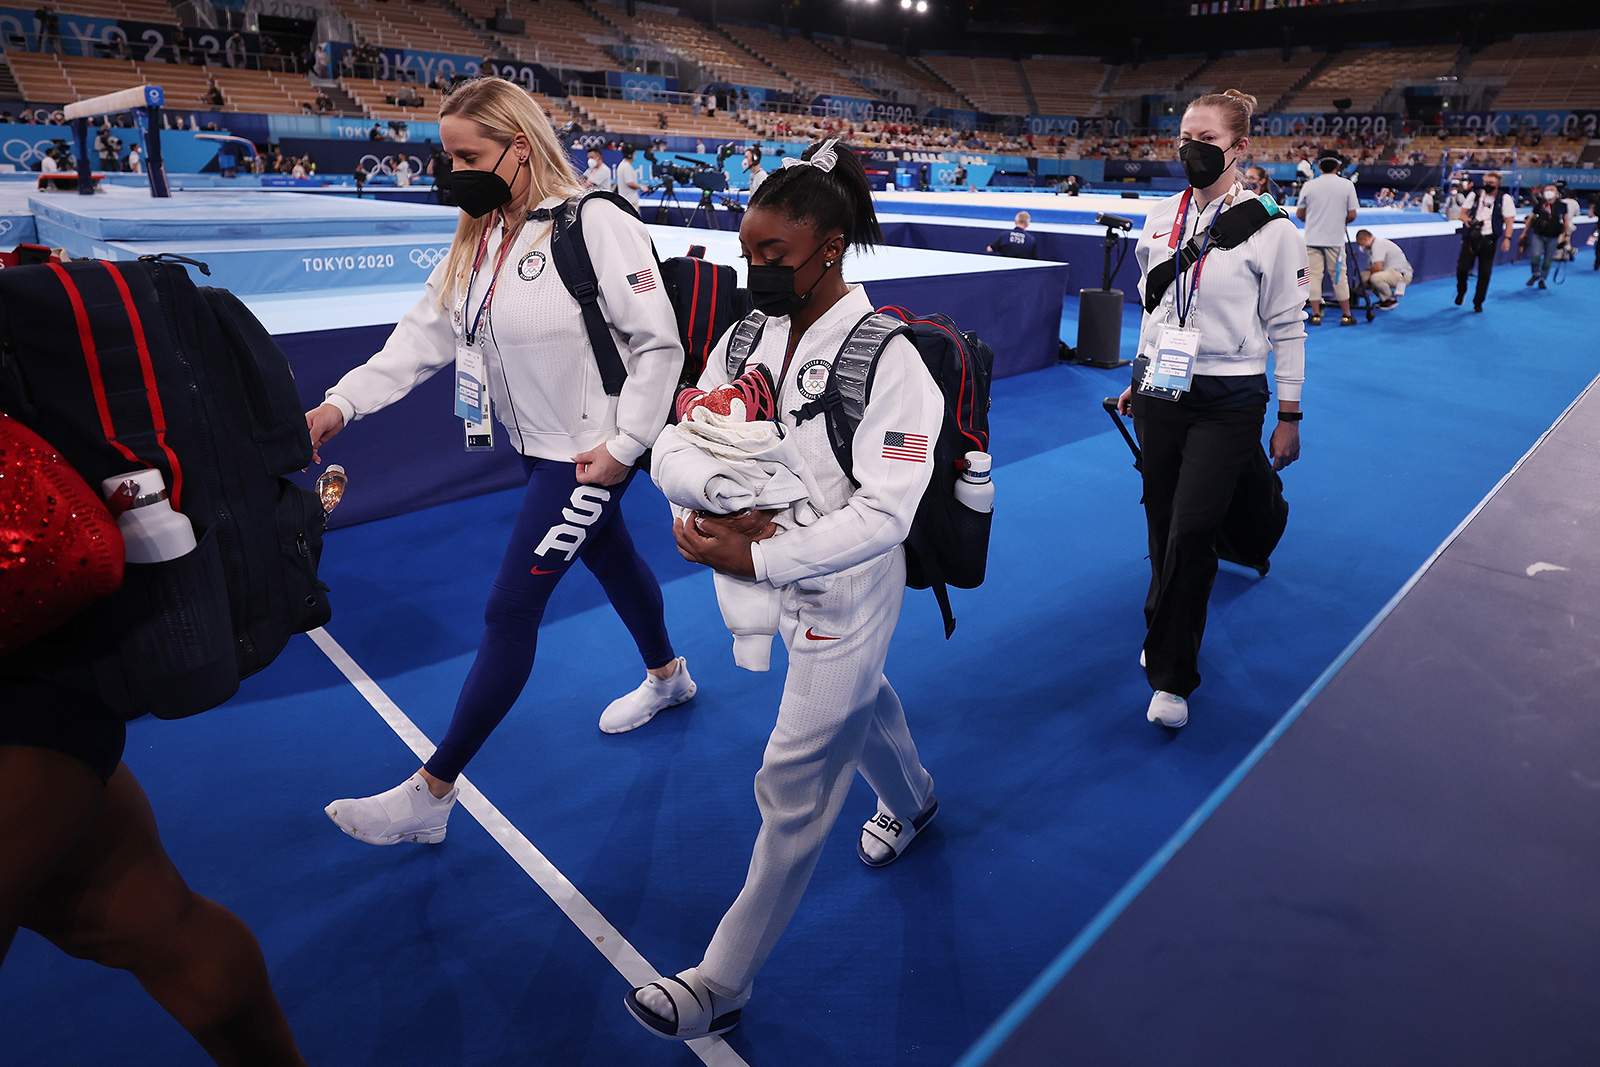 USA gymnast Simone Biles walks off the floor during the women's gymnastics team final on July 27.